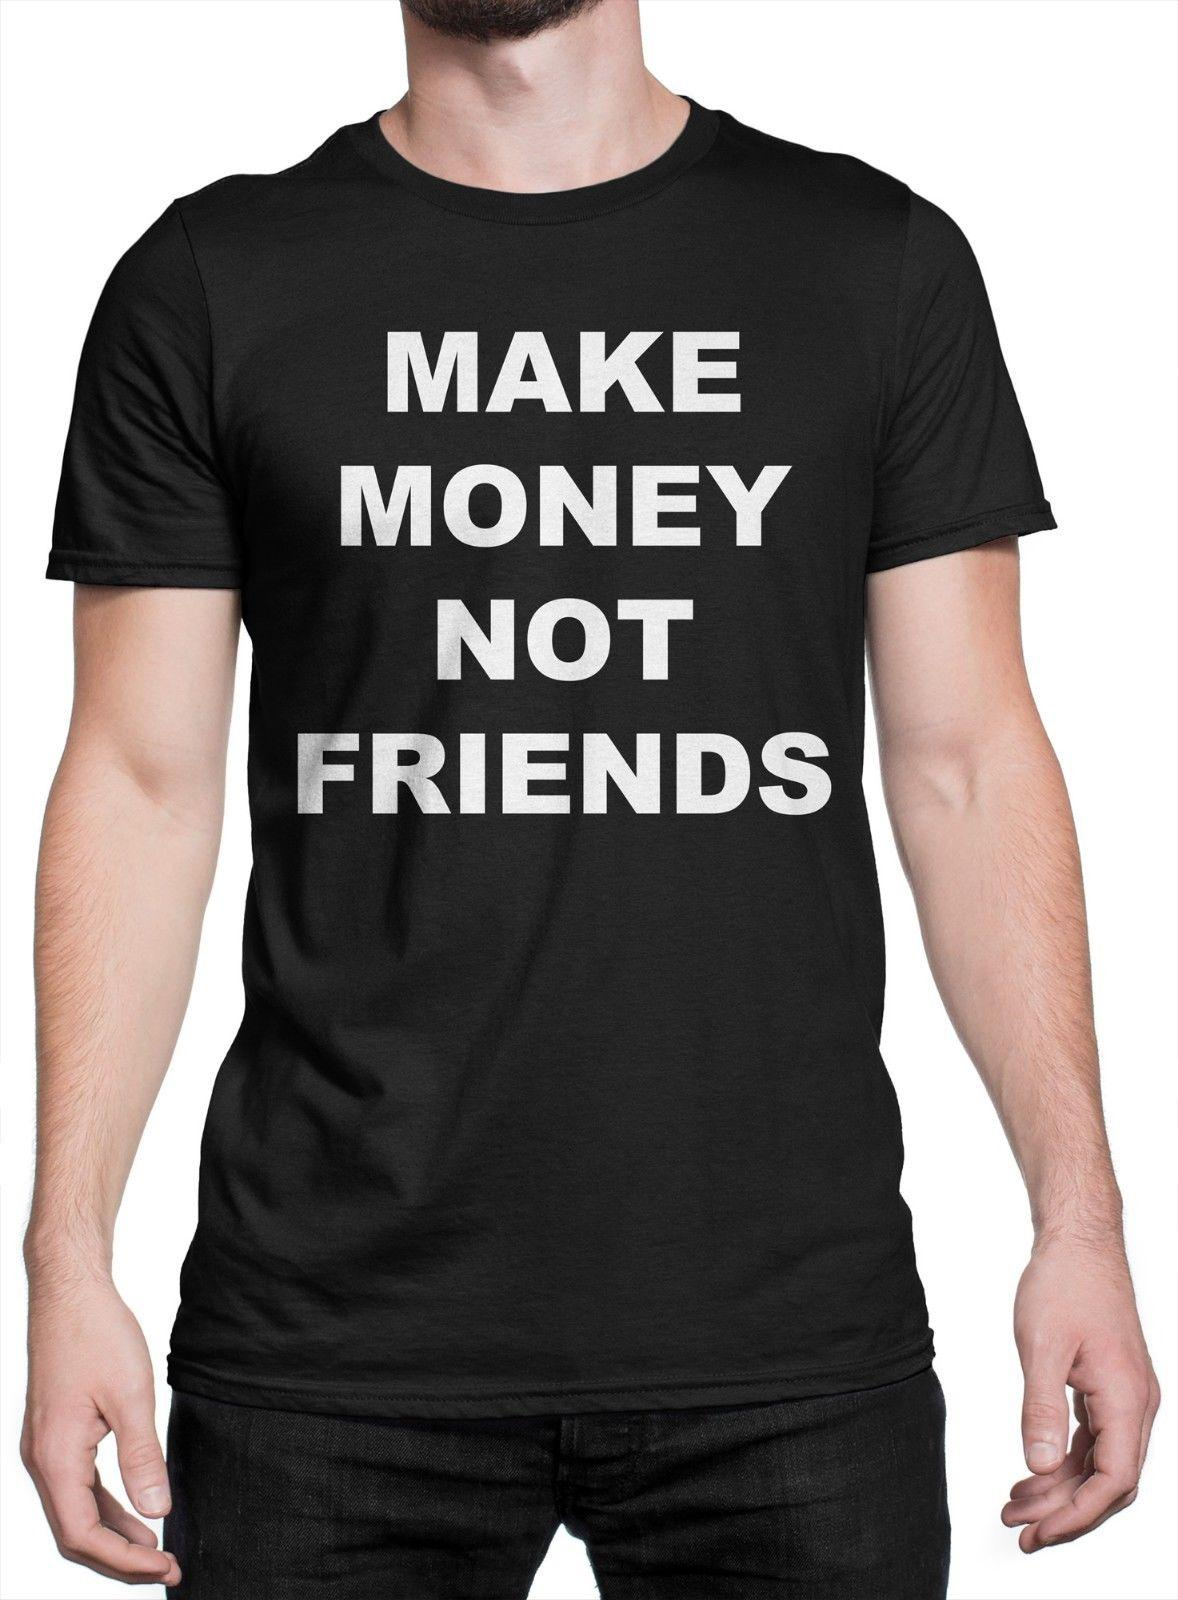 pretty nice 3386c 9d876 T-shirt Uomo Make Money Not Friends - maglietta 100% cotone - NERO top free  shipping t-shirt RETRO VINTAGE Classic t-shirt